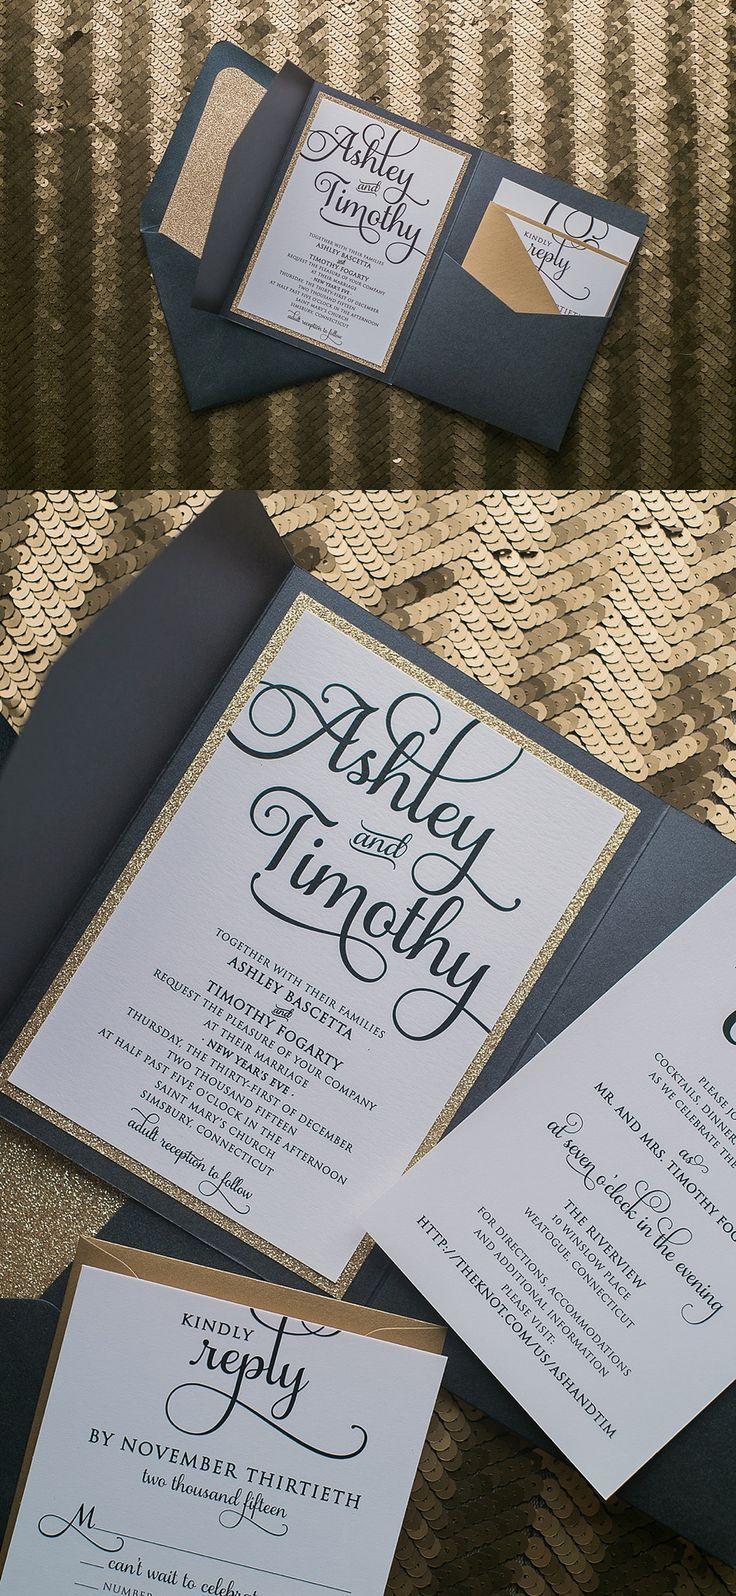 Best 25 wedding invitations ideas on pinterest wedding for Most formal wedding invitations